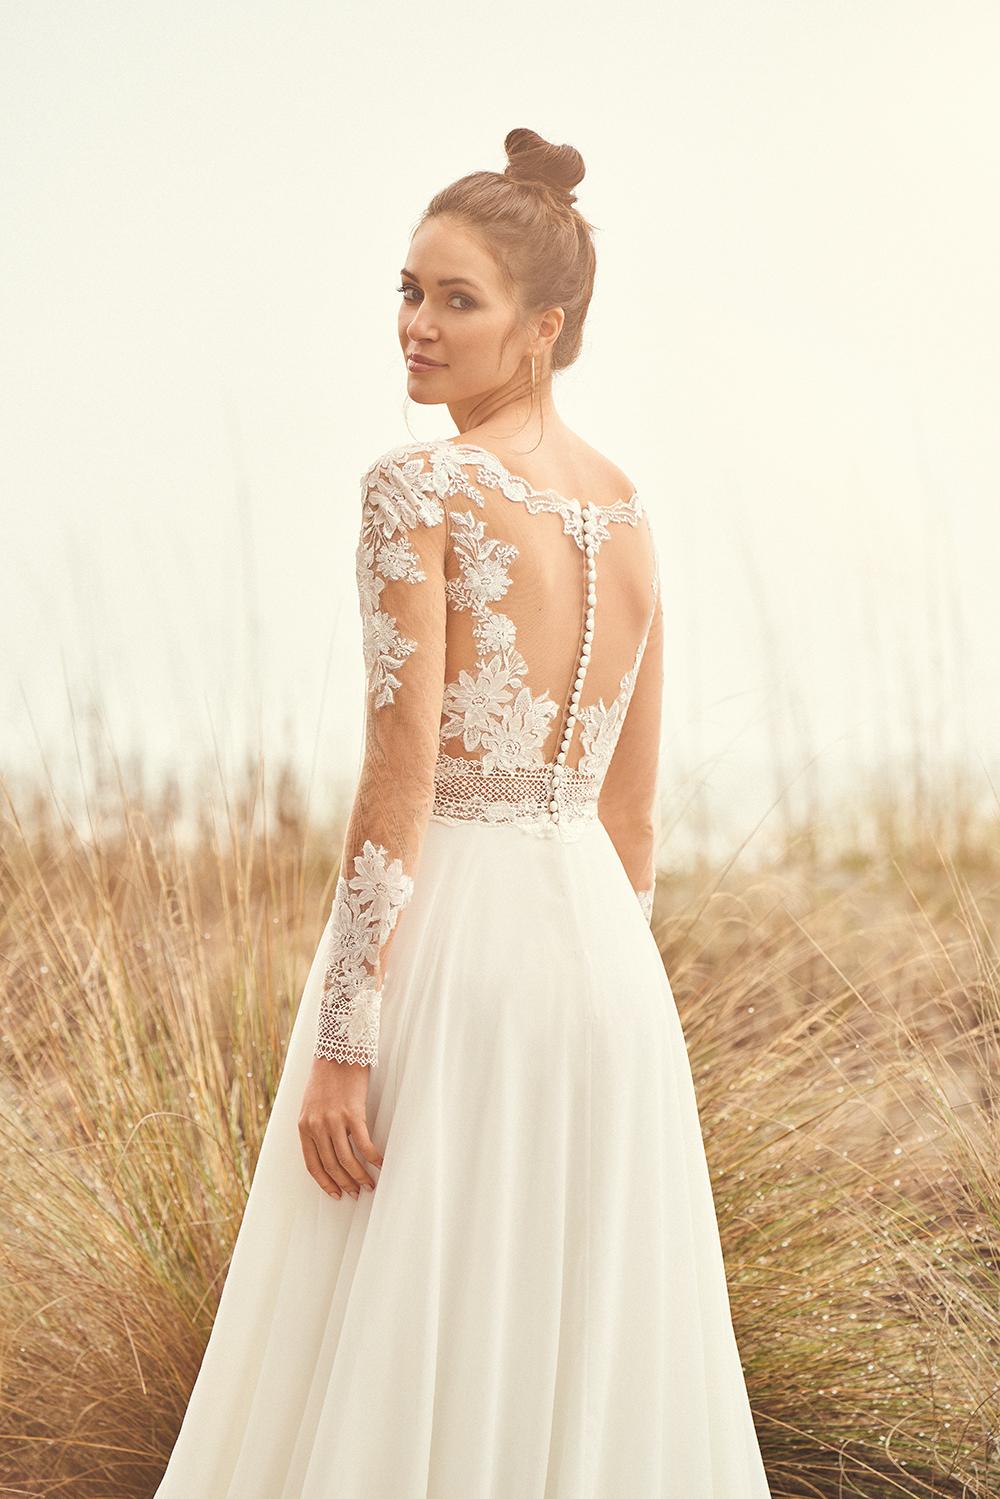 Long sleeved wedding dress from Alison Kirk Bridal in 2020